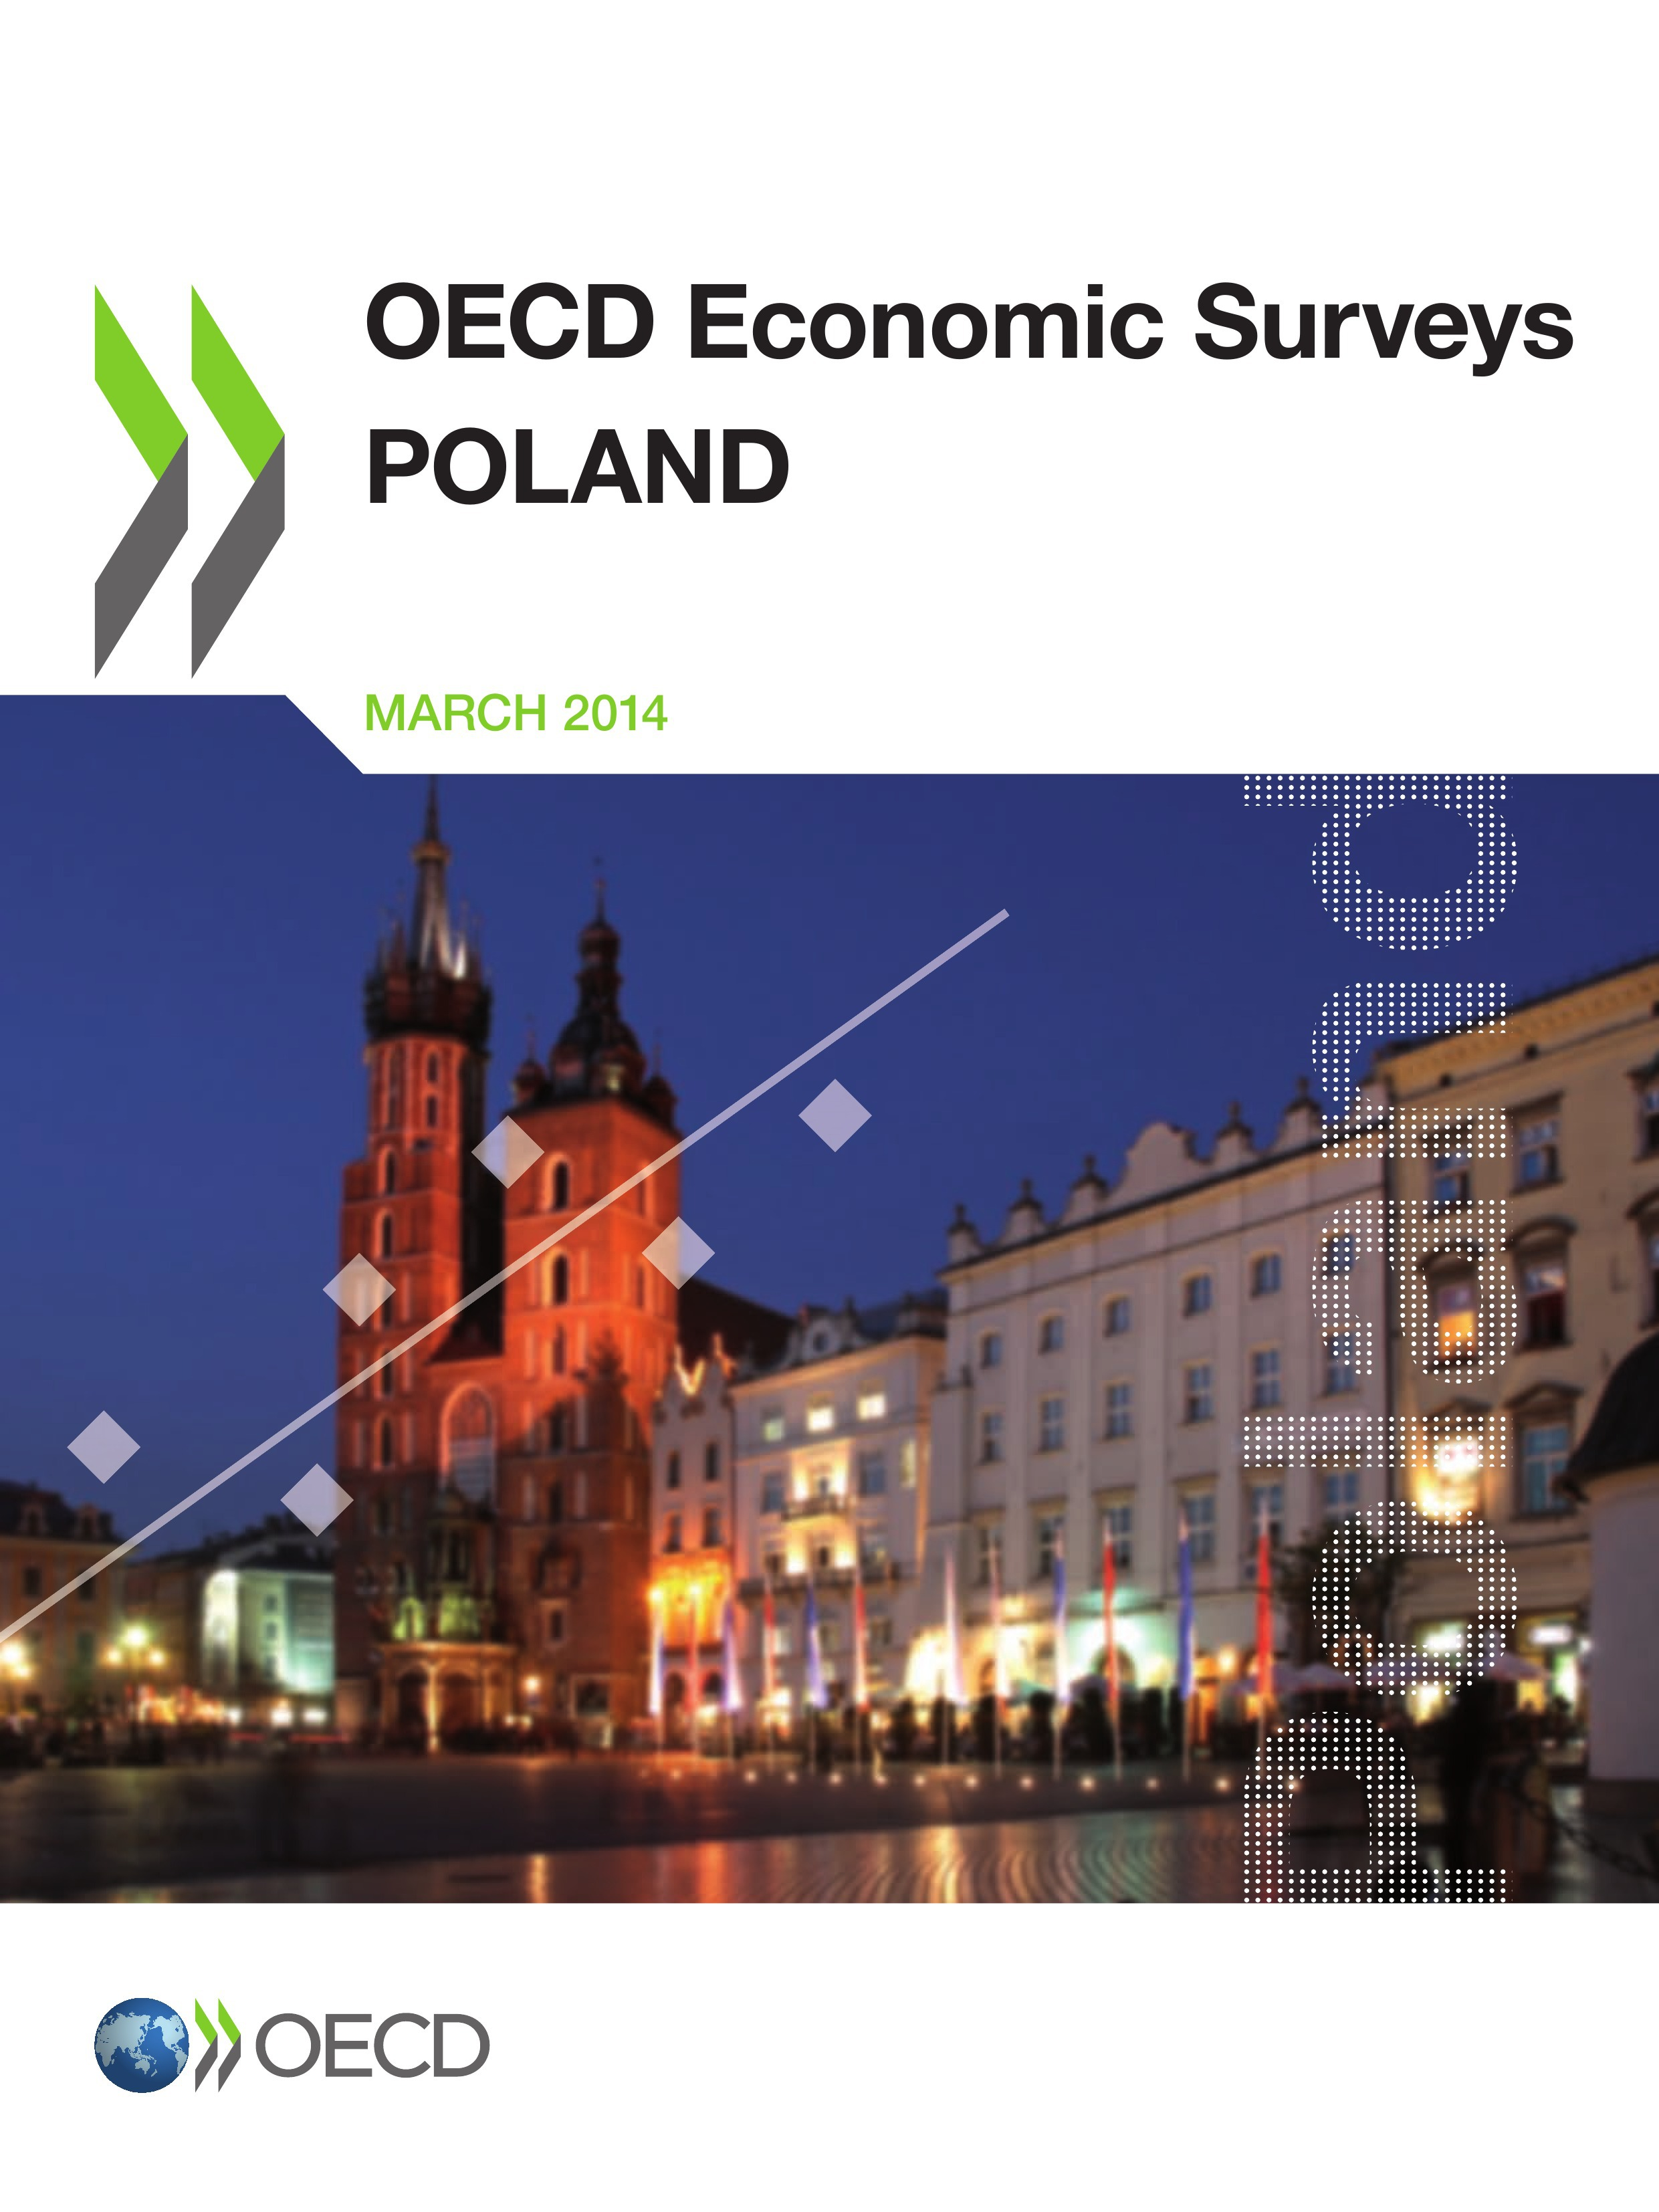 OECD Economic Surveys : Poland 2014